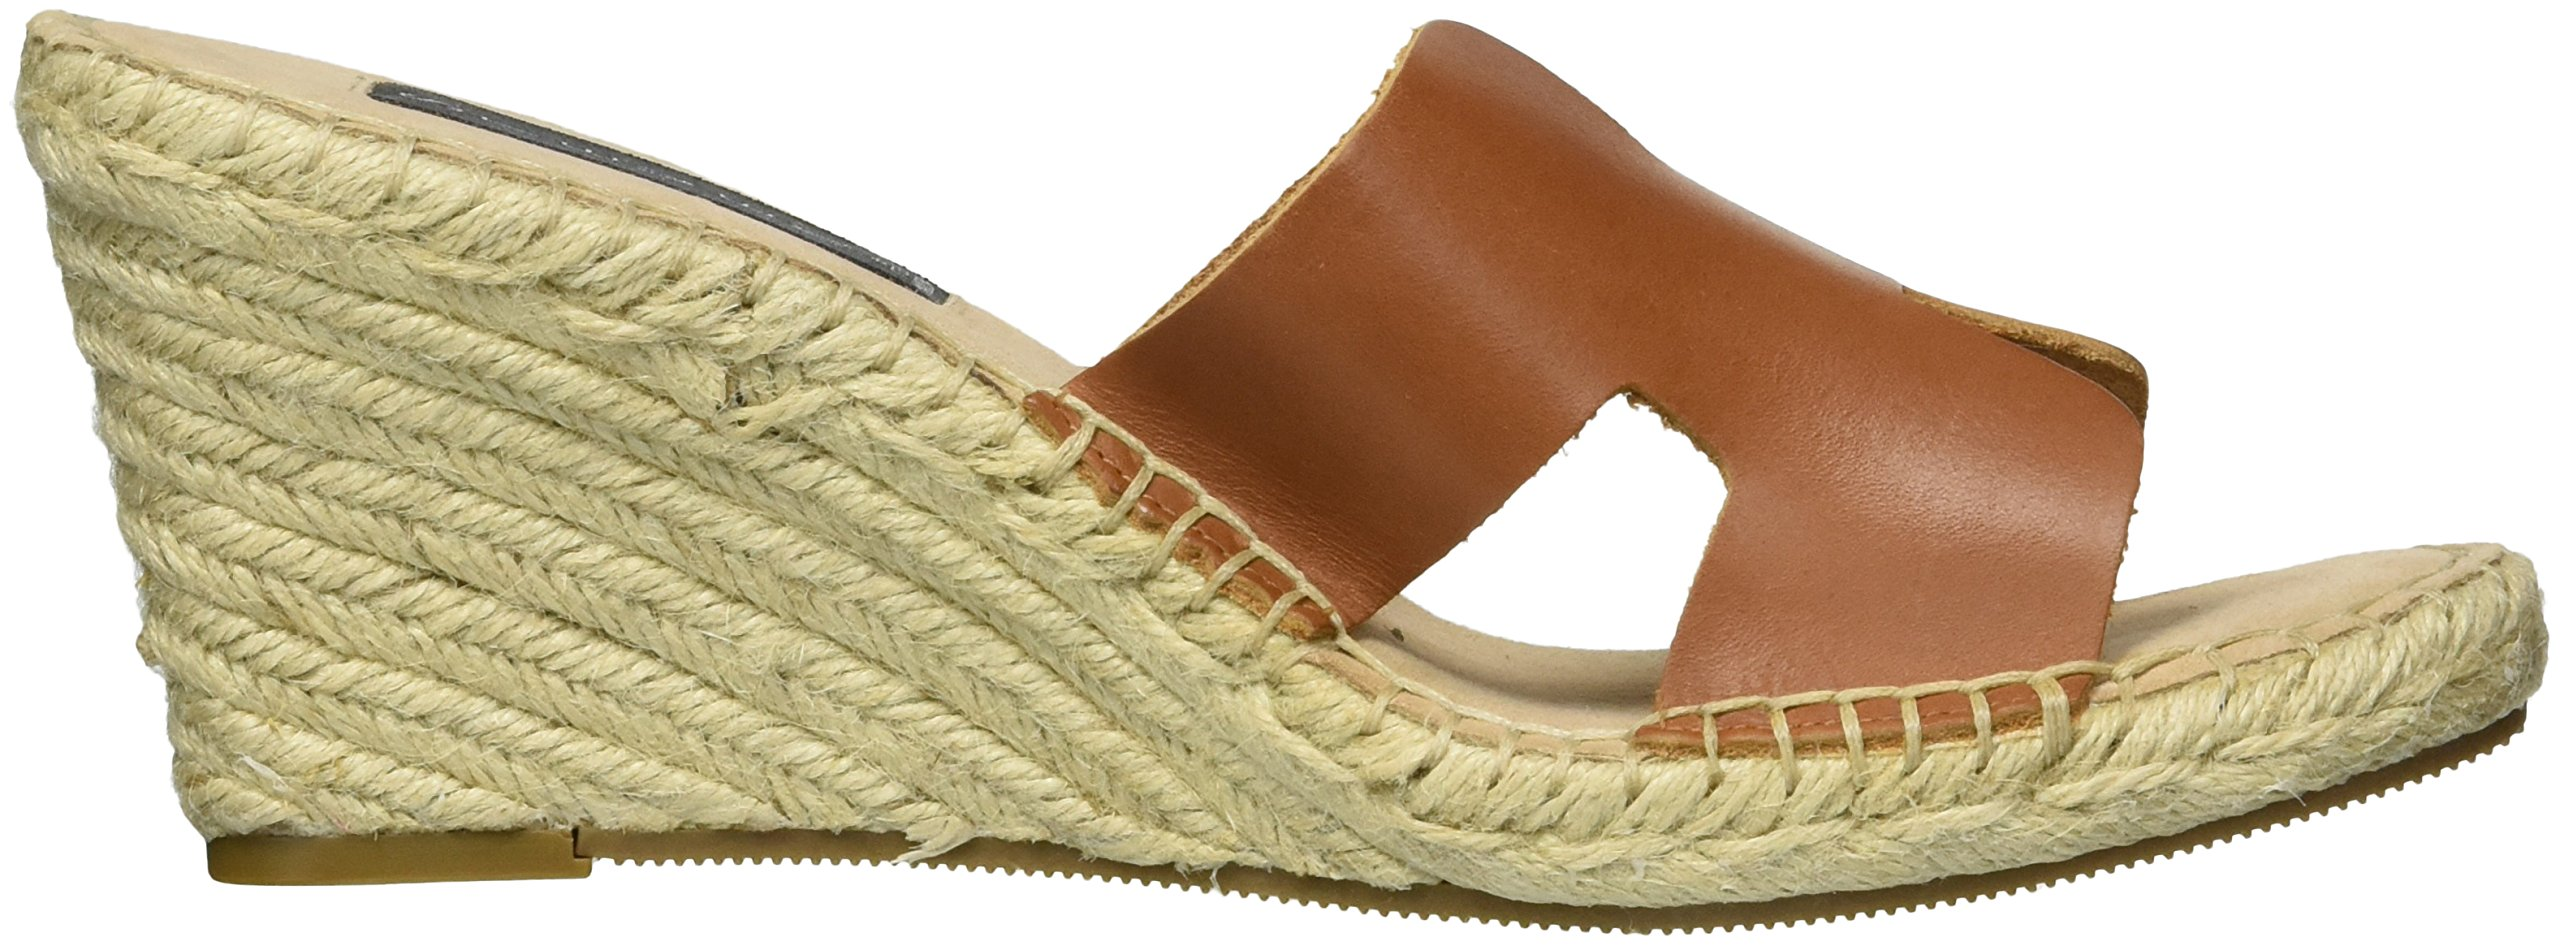 40873a3e672 STEVEN by Steve Madden Women's Eryk Wedge Sandal, Cognac Leather, 7 ...